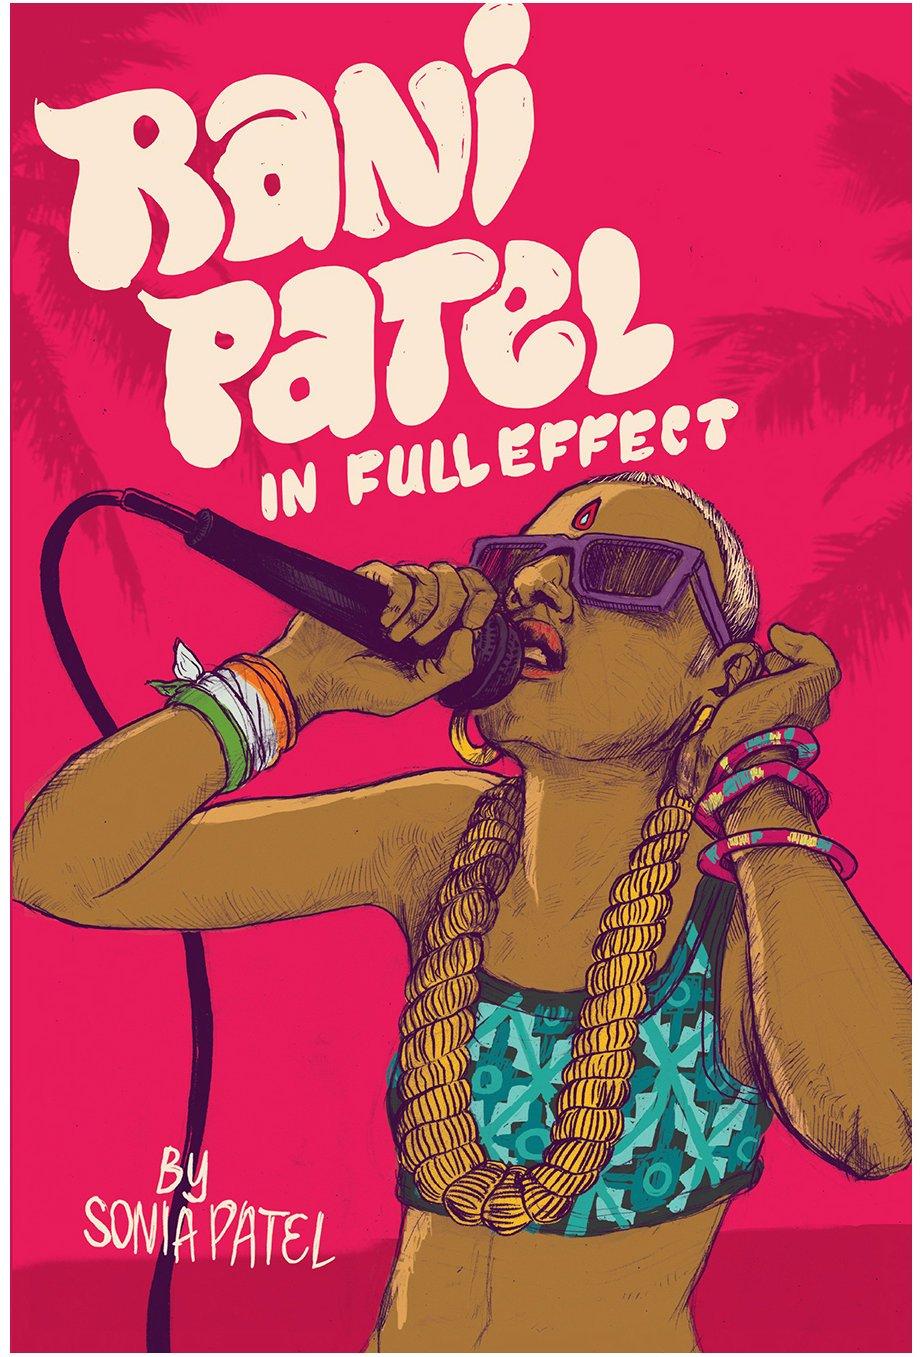 Rani Patel in Full Effect,  by Sonia Patel